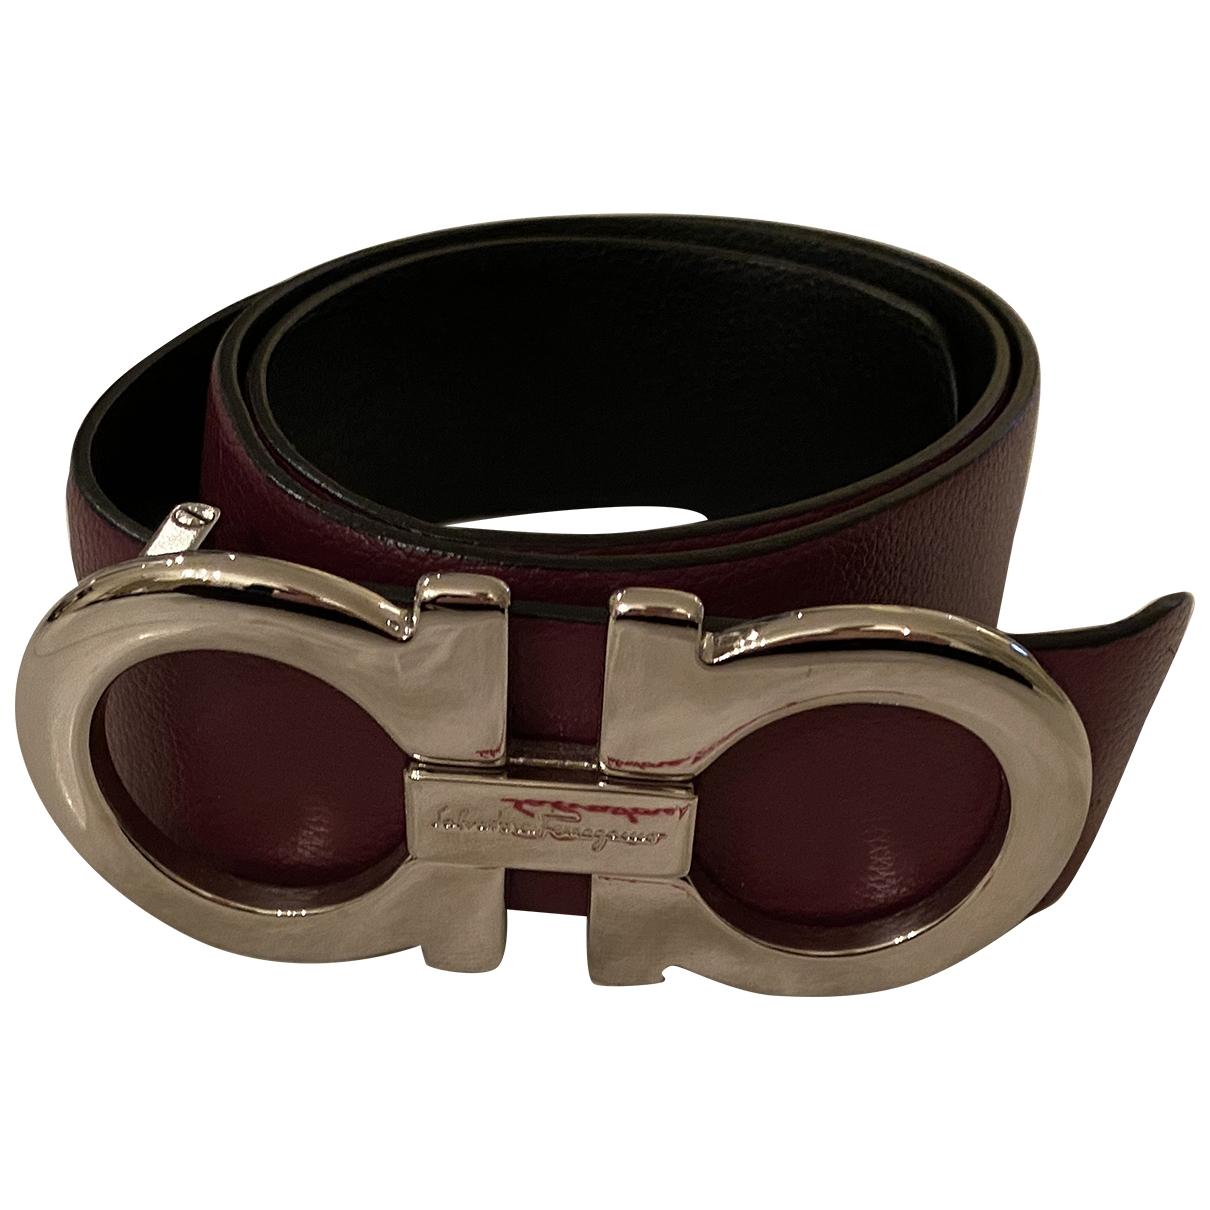 Salvatore Ferragamo \N Burgundy Leather belt for Women 95 cm